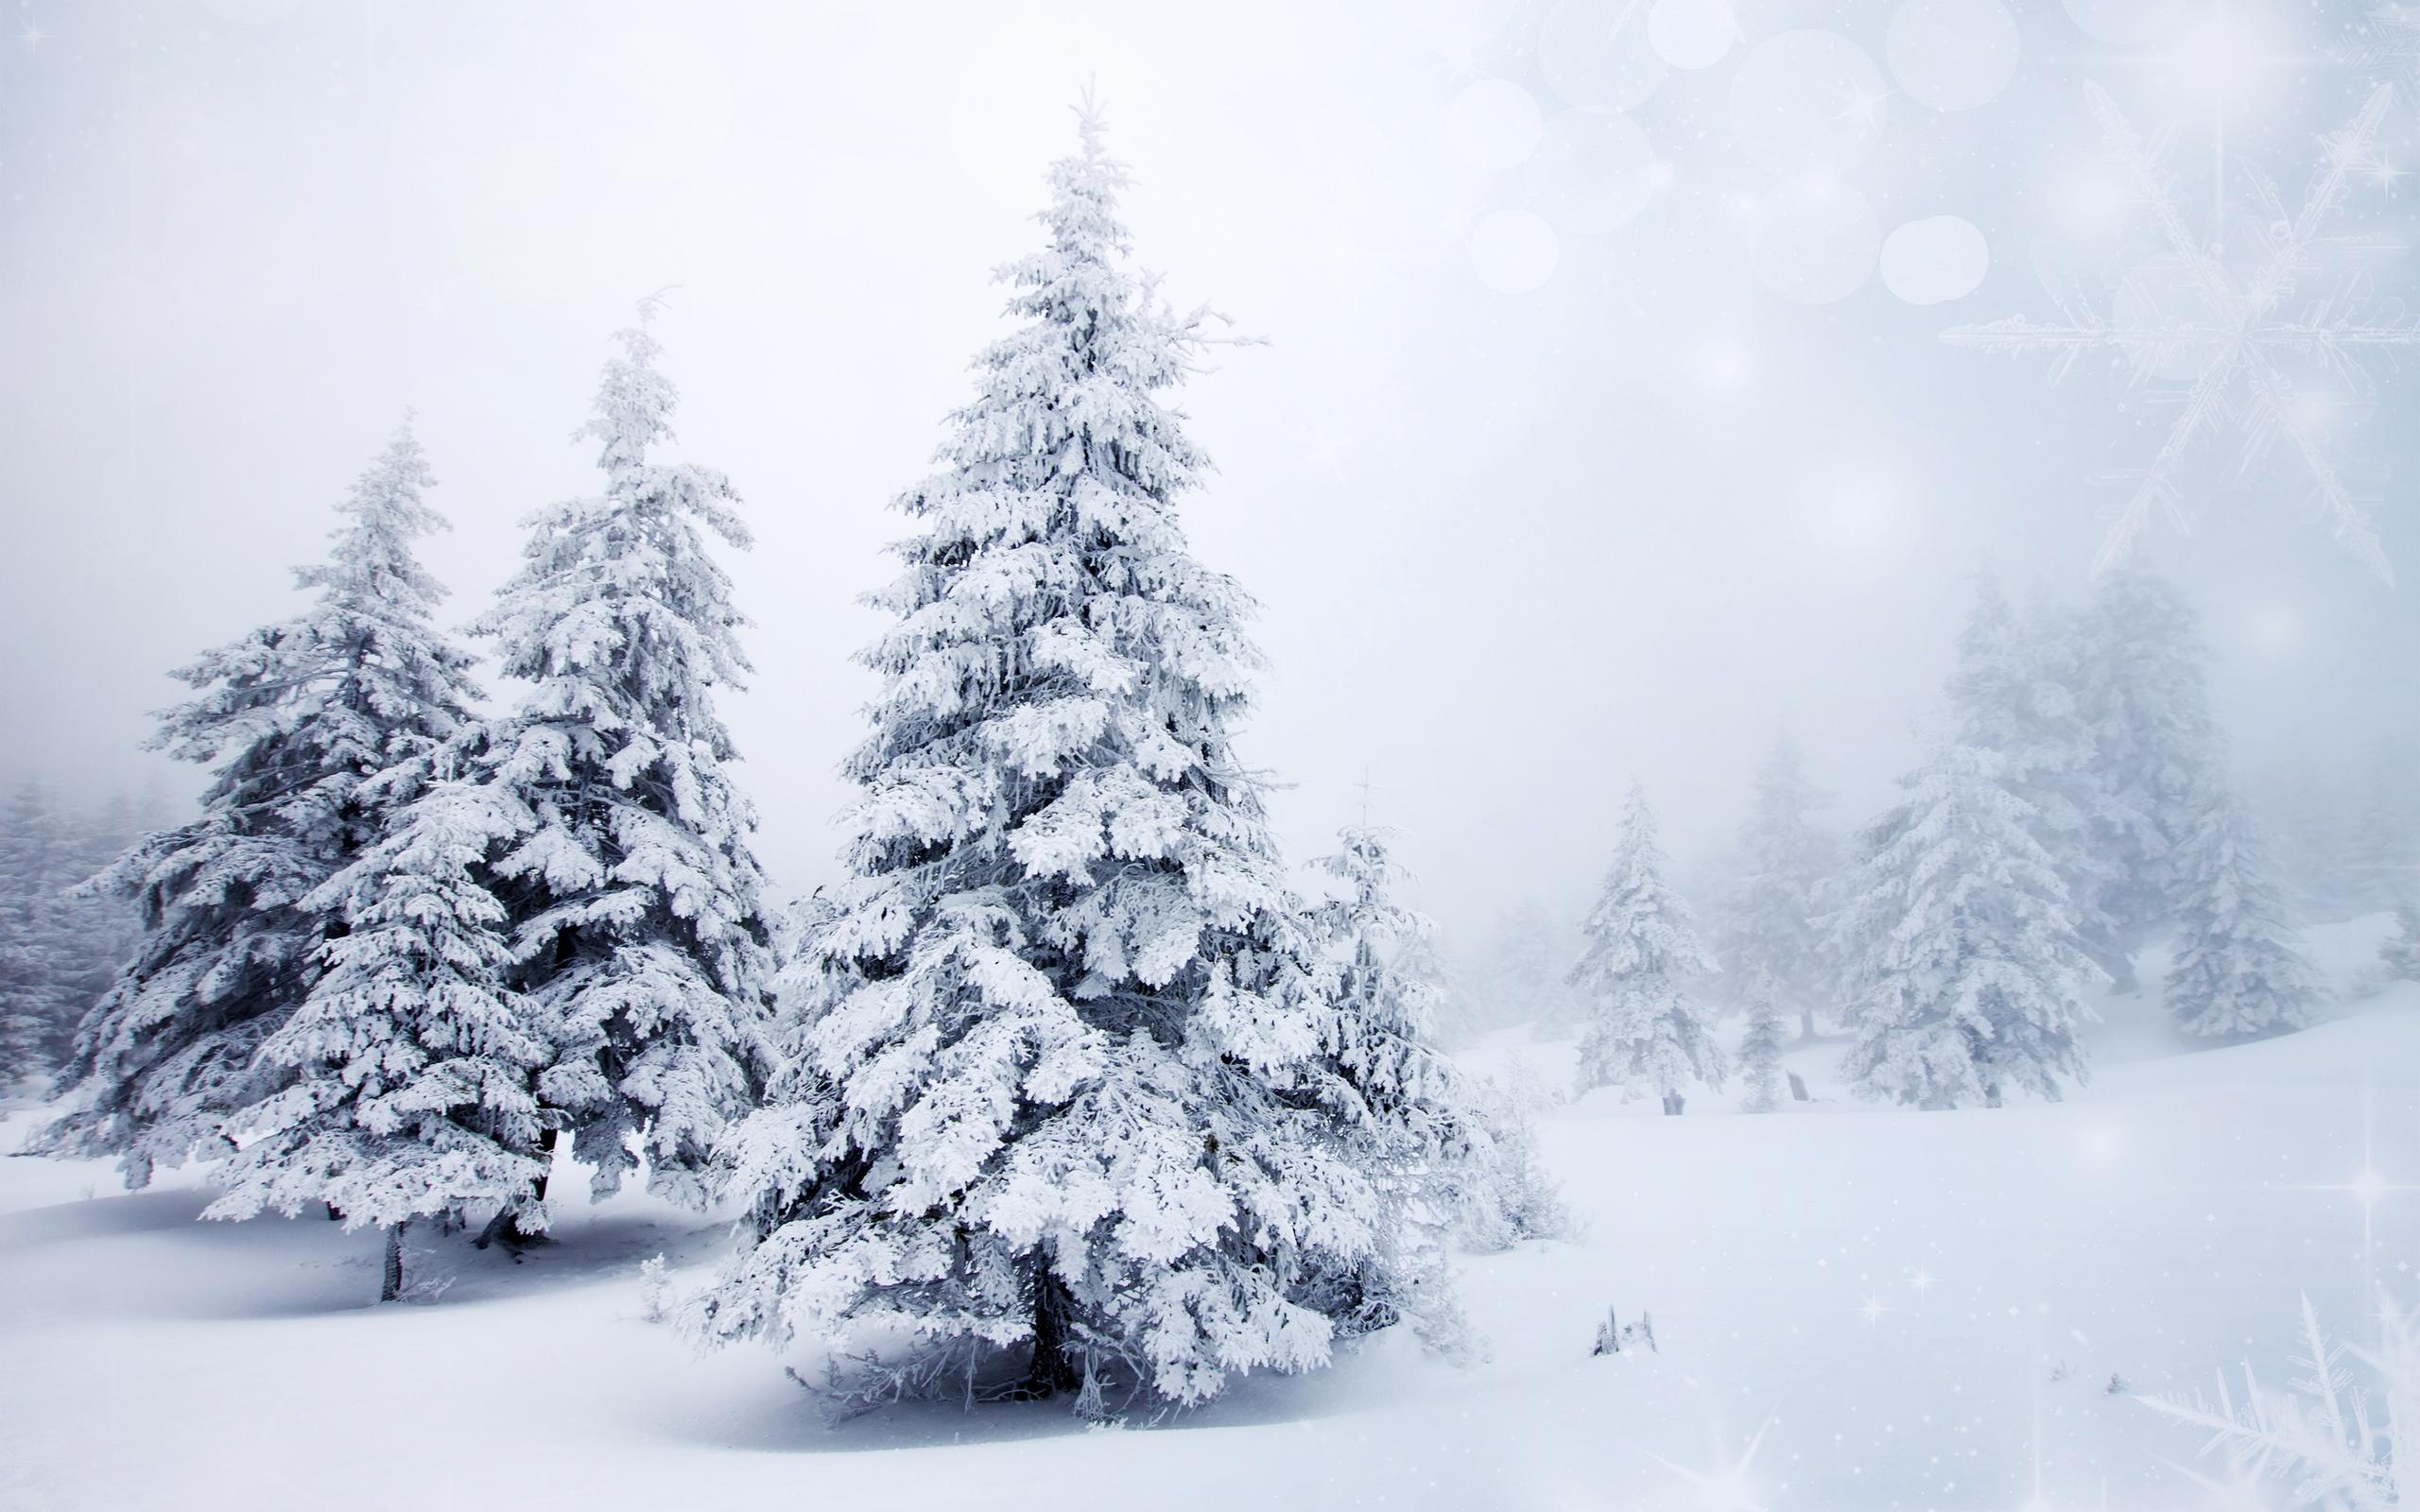 trees spruce winter snow f wallpaper 2560x1600 202143